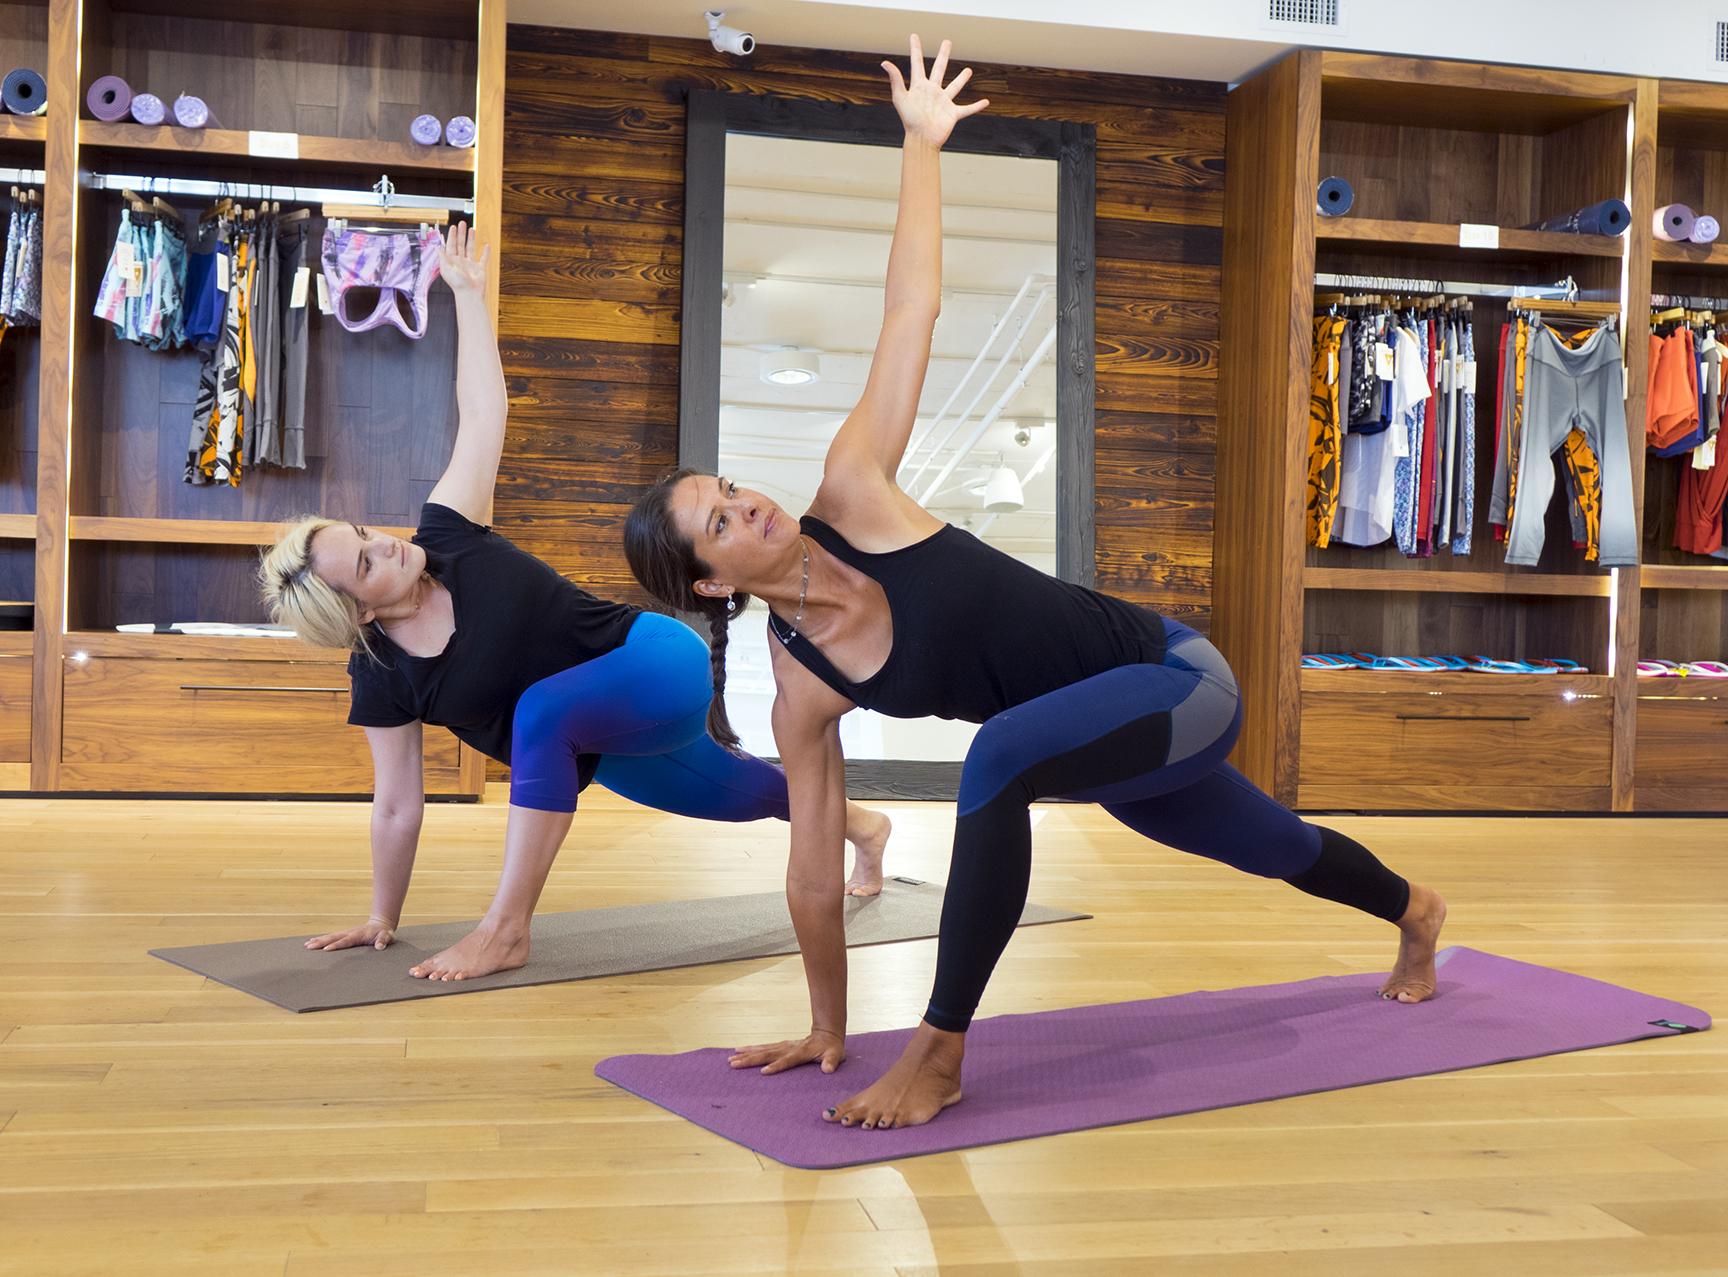 Tah yoga smoga DSC03650.jpeg